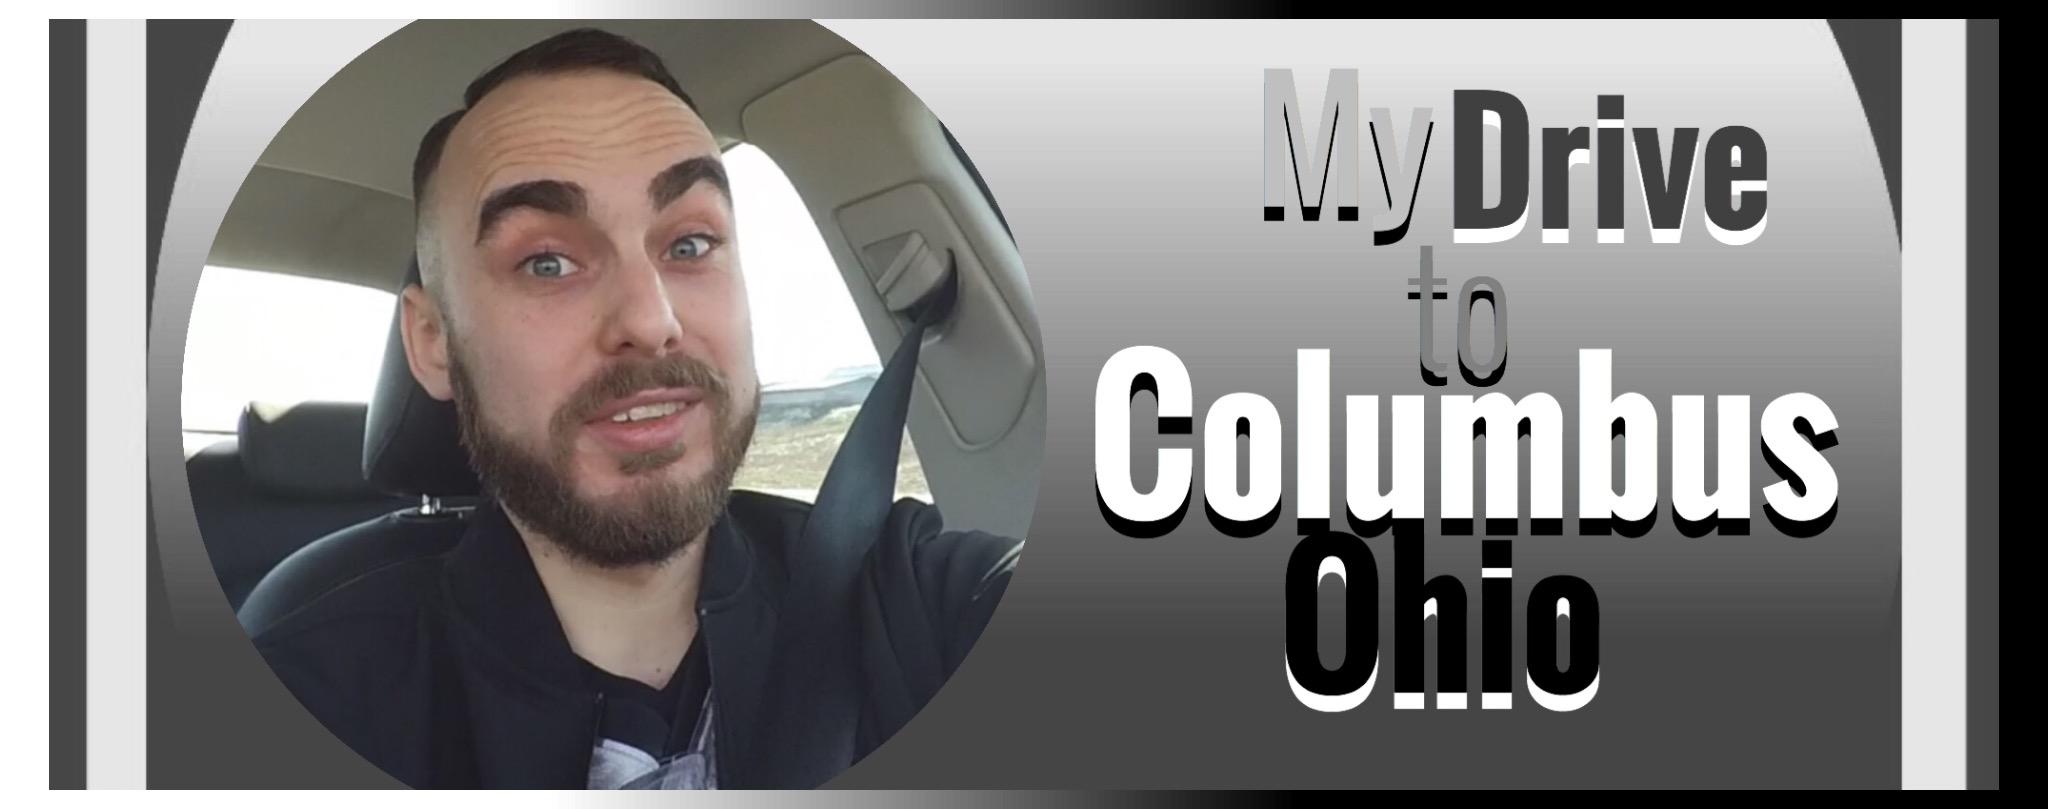 columbus-thumbnail.JPG